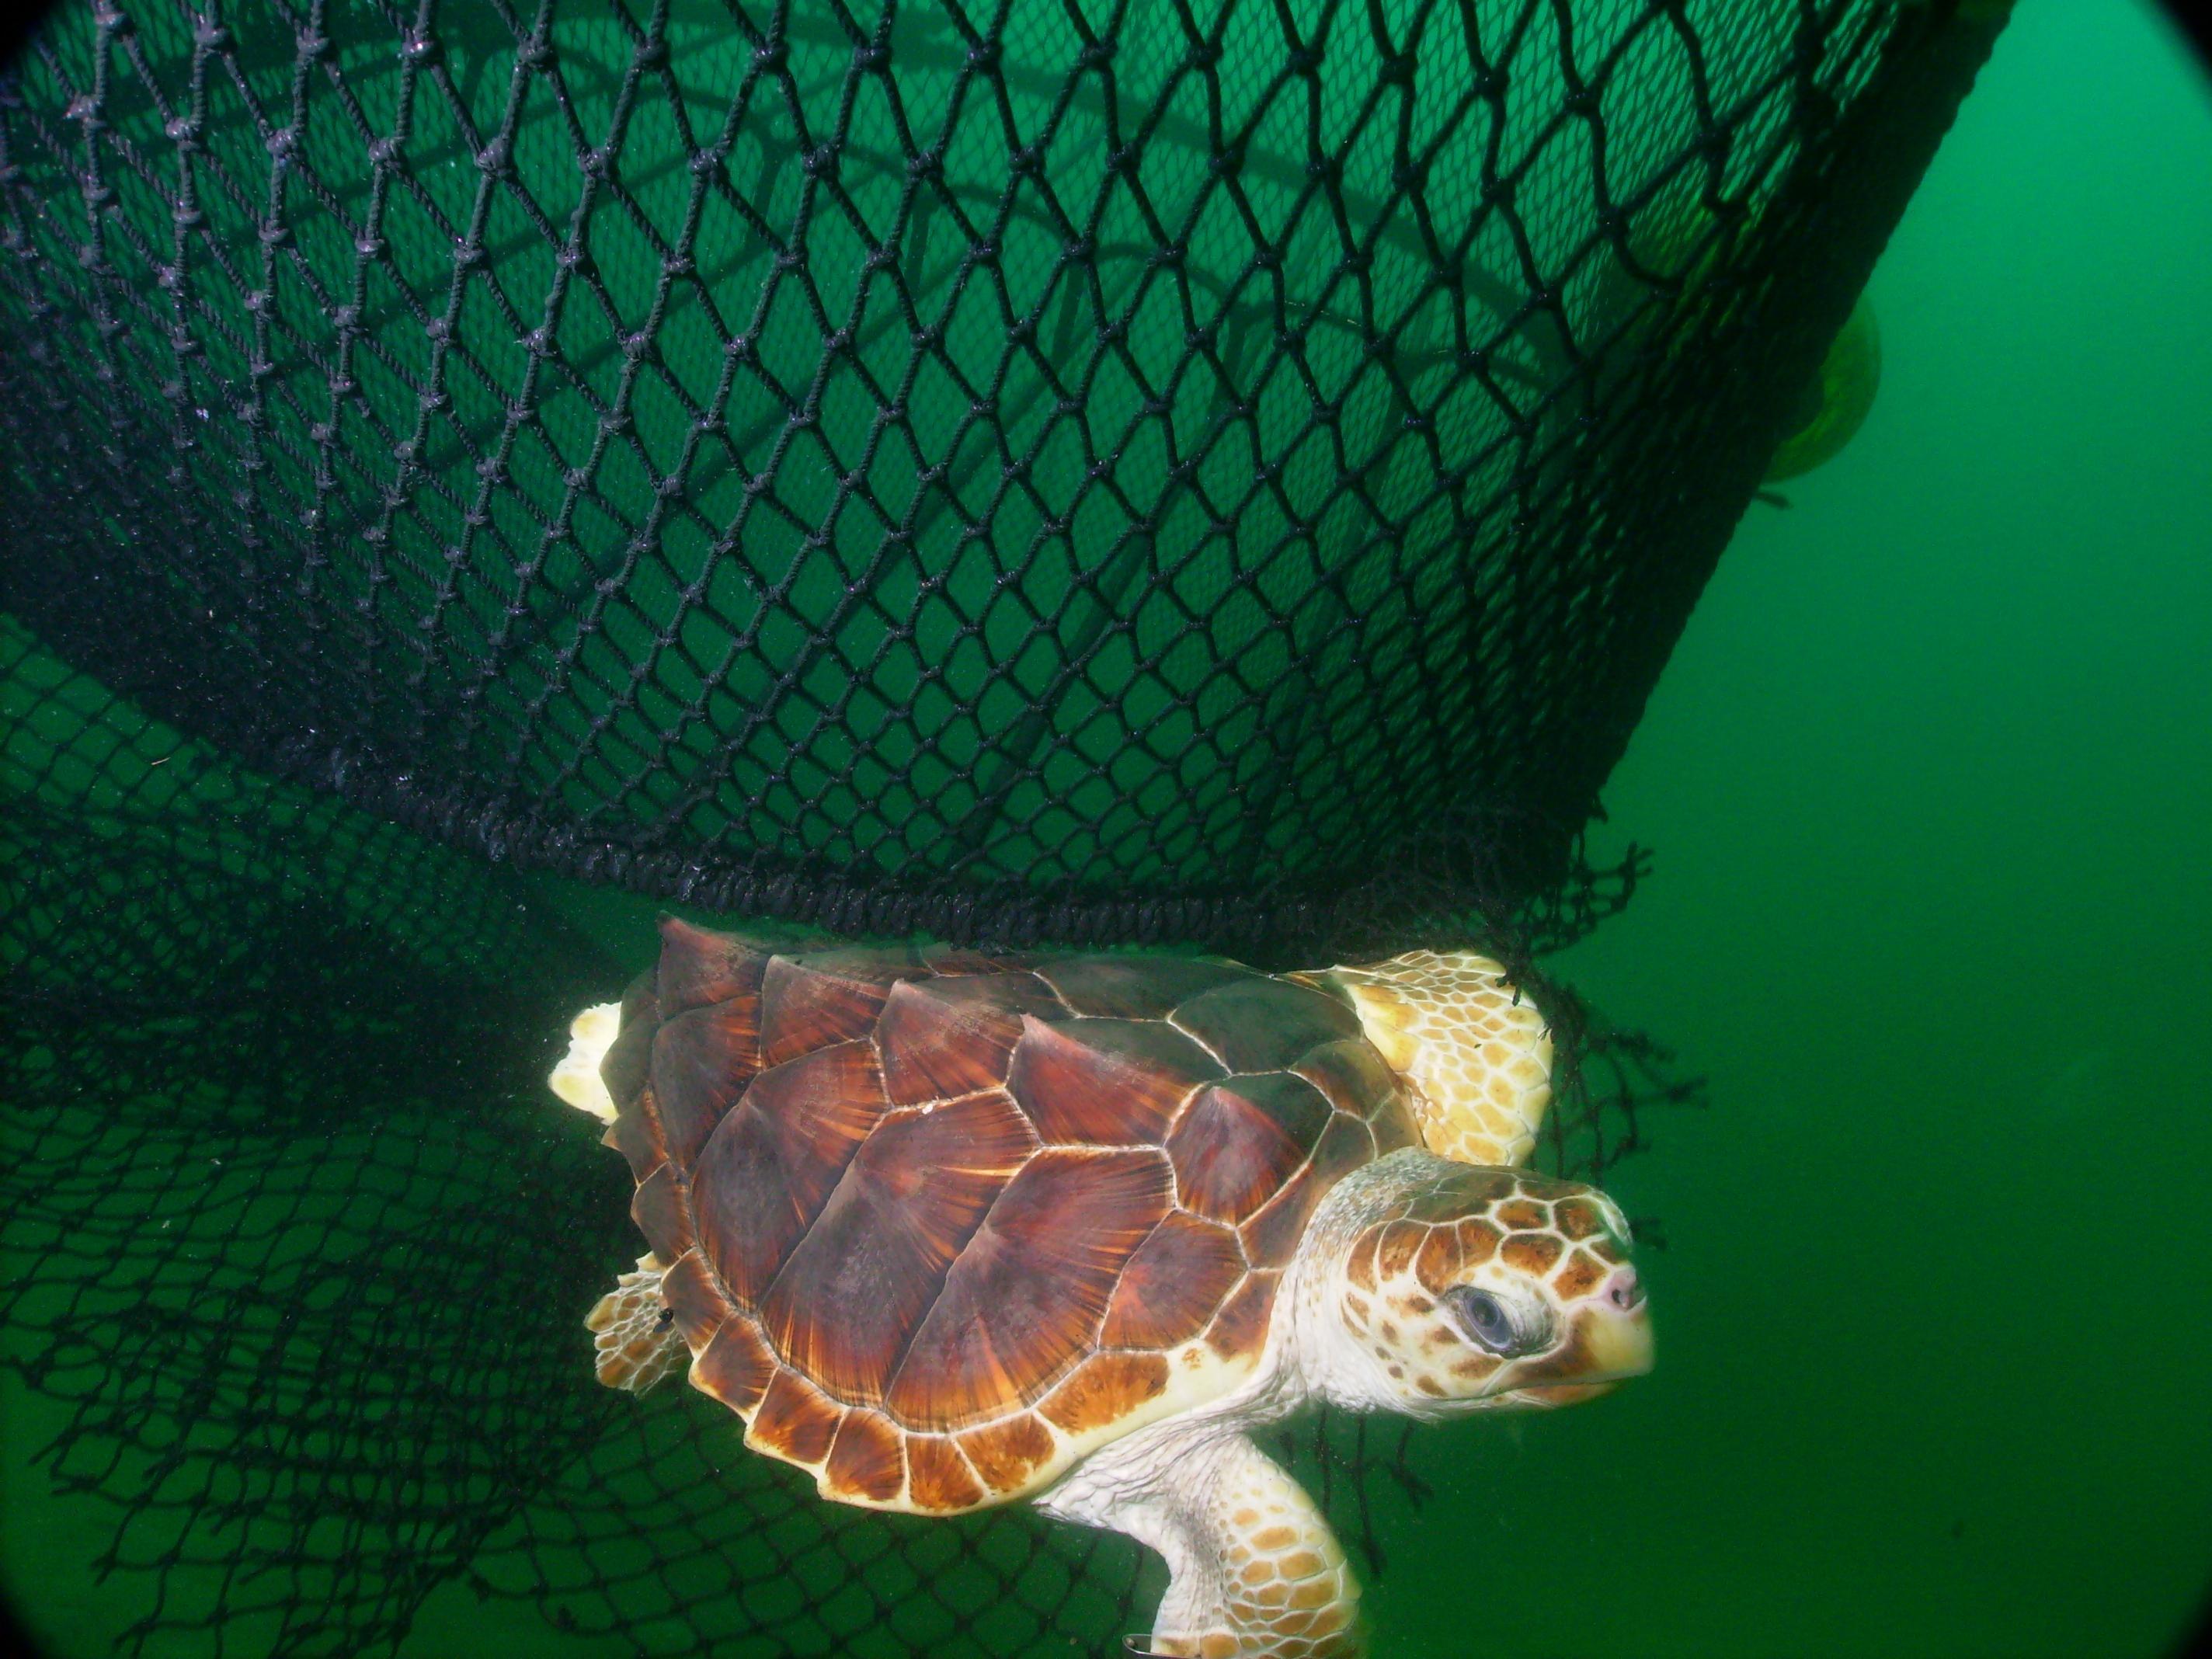 Two federal agencies say loggerhead sea turtles on West Coast are endangered.